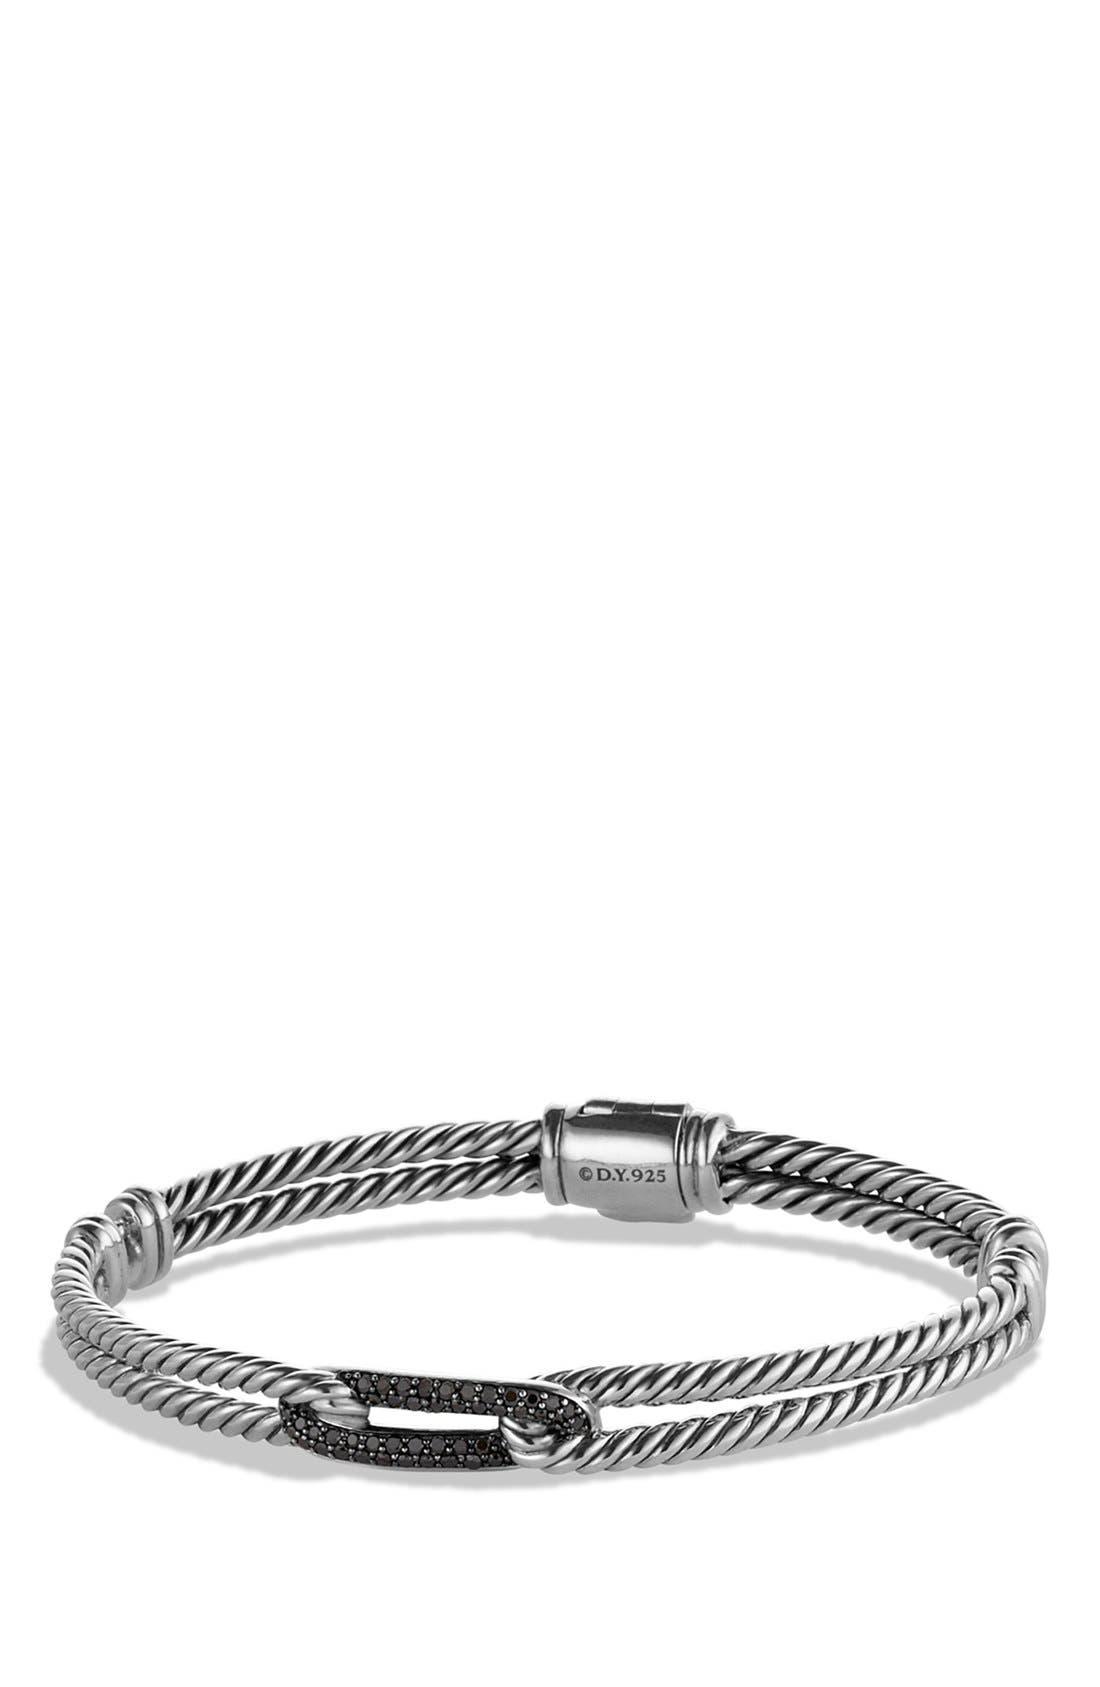 David Yurman Petite Pavé 'Labyrinth' Mini Single Loop Bracelet with Diamonds in Gold